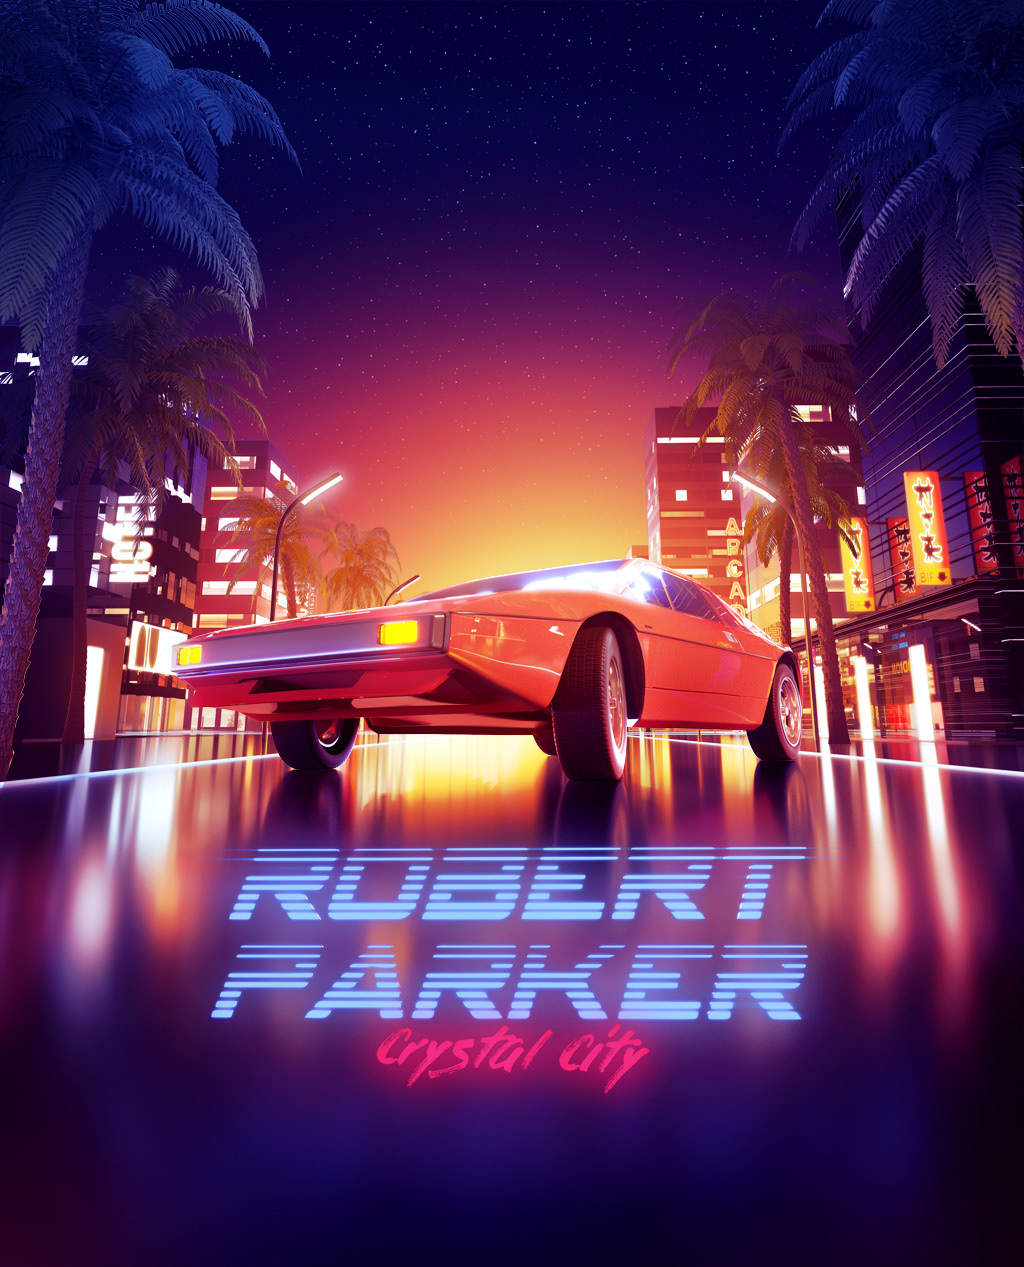 RobertParker_CrystalCity (6)